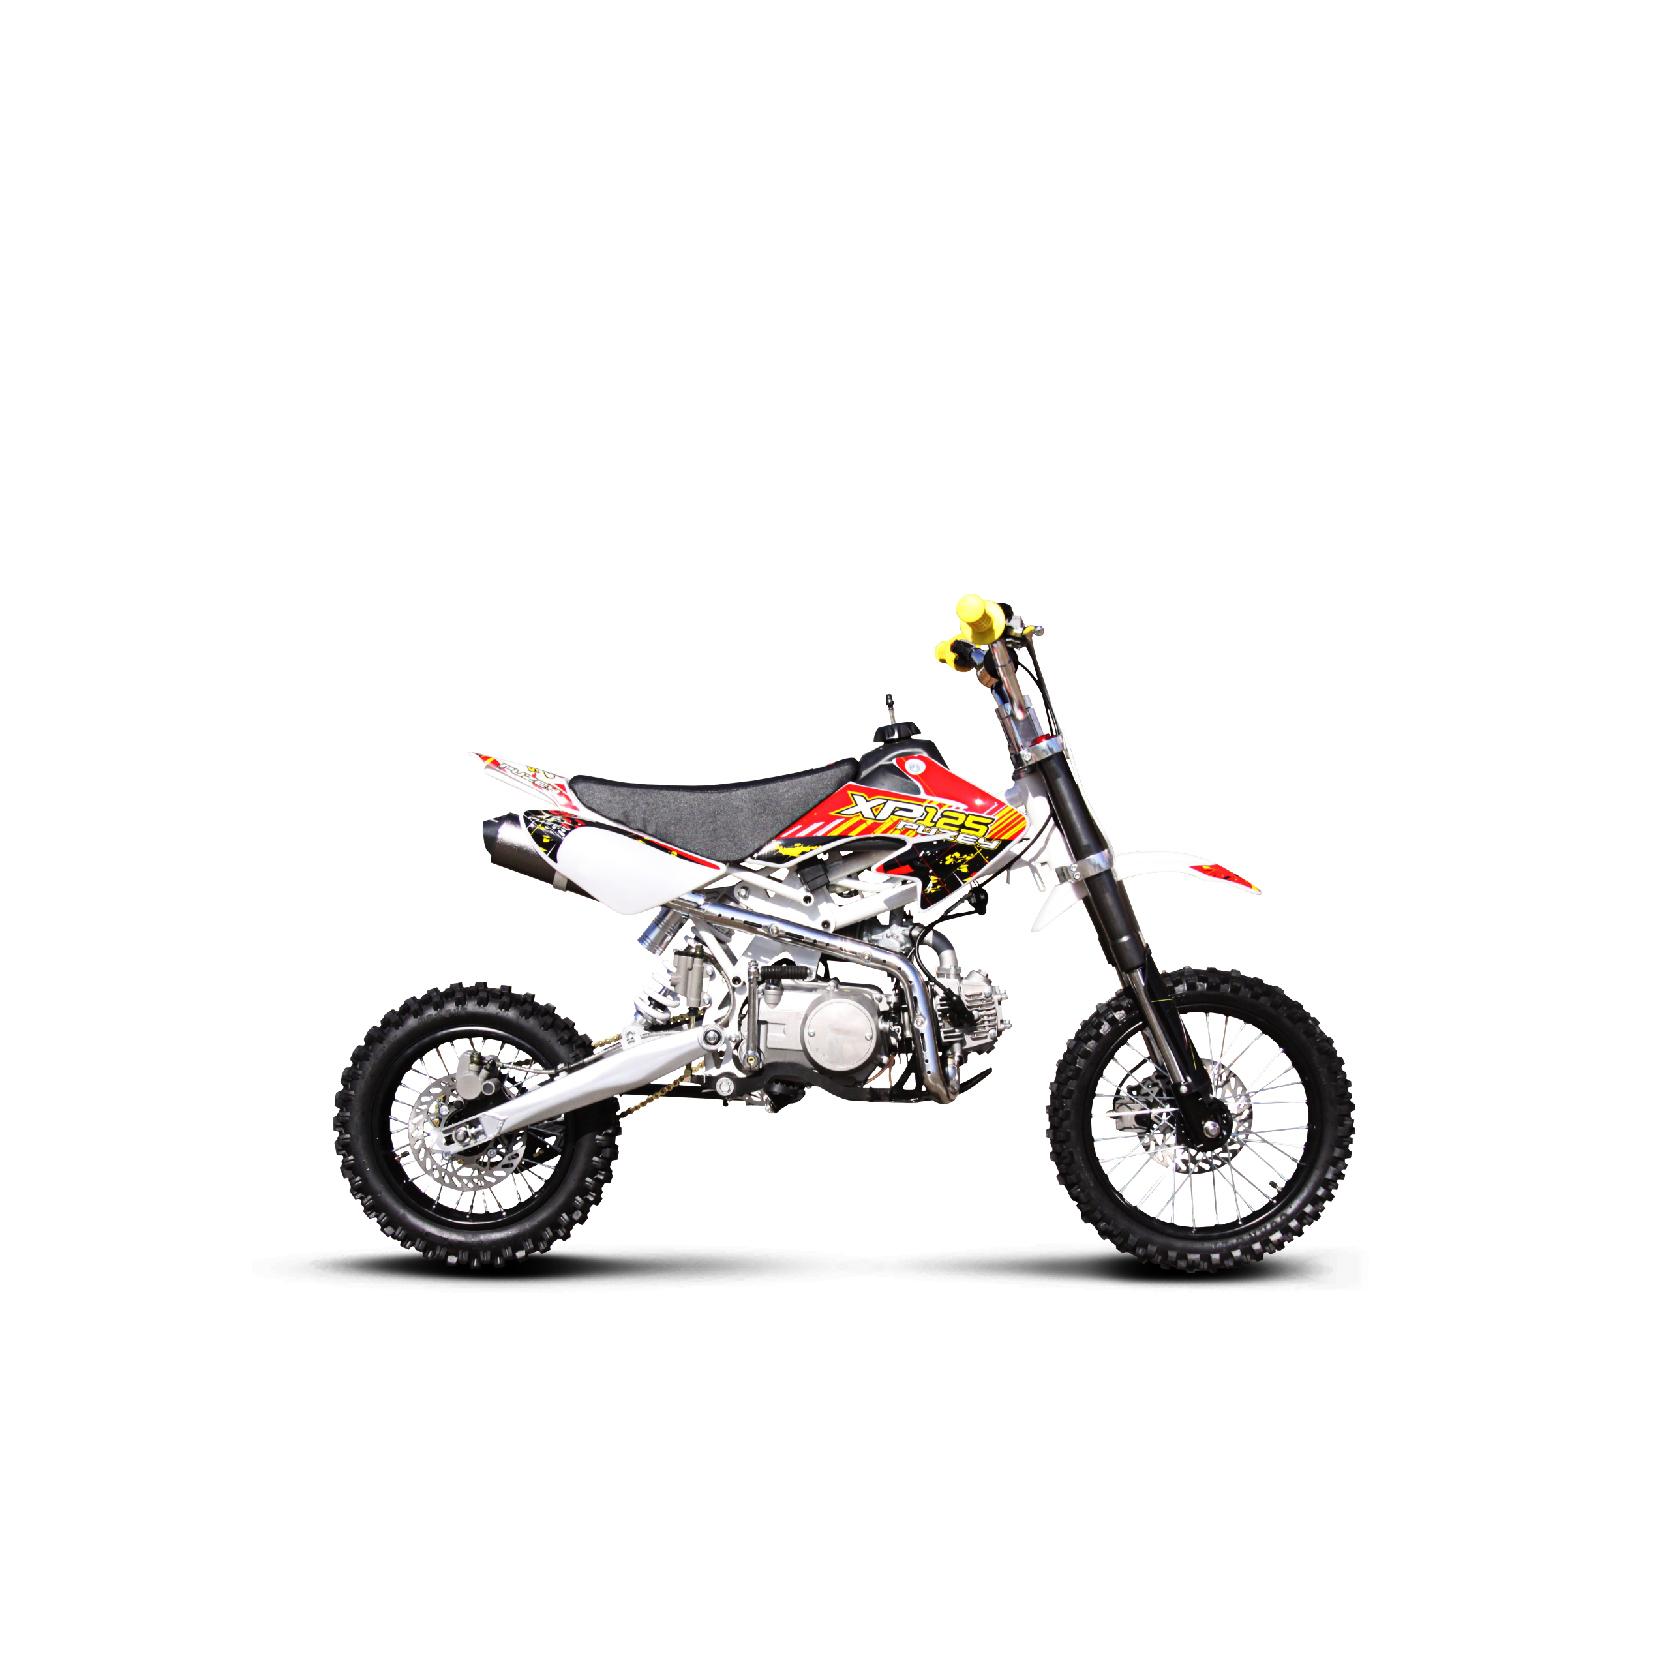 Puzey XP 125cc Image